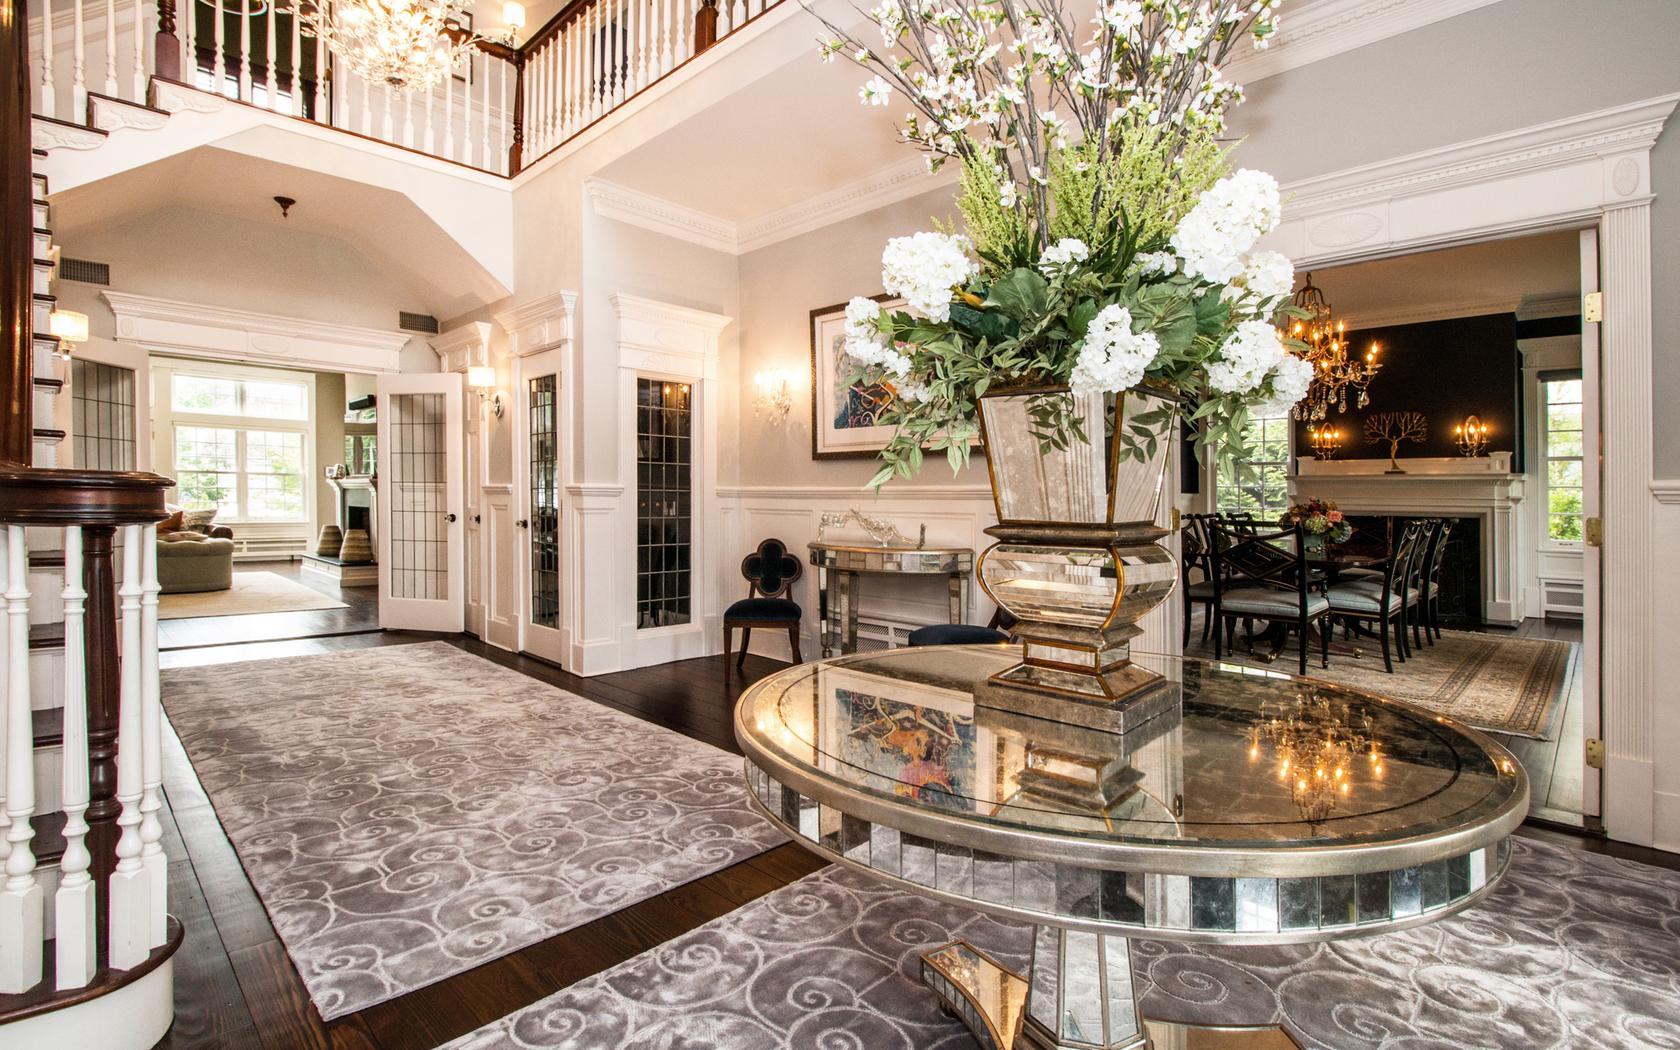 featured property 376 ridgewood ave glen ridge nj stunning share